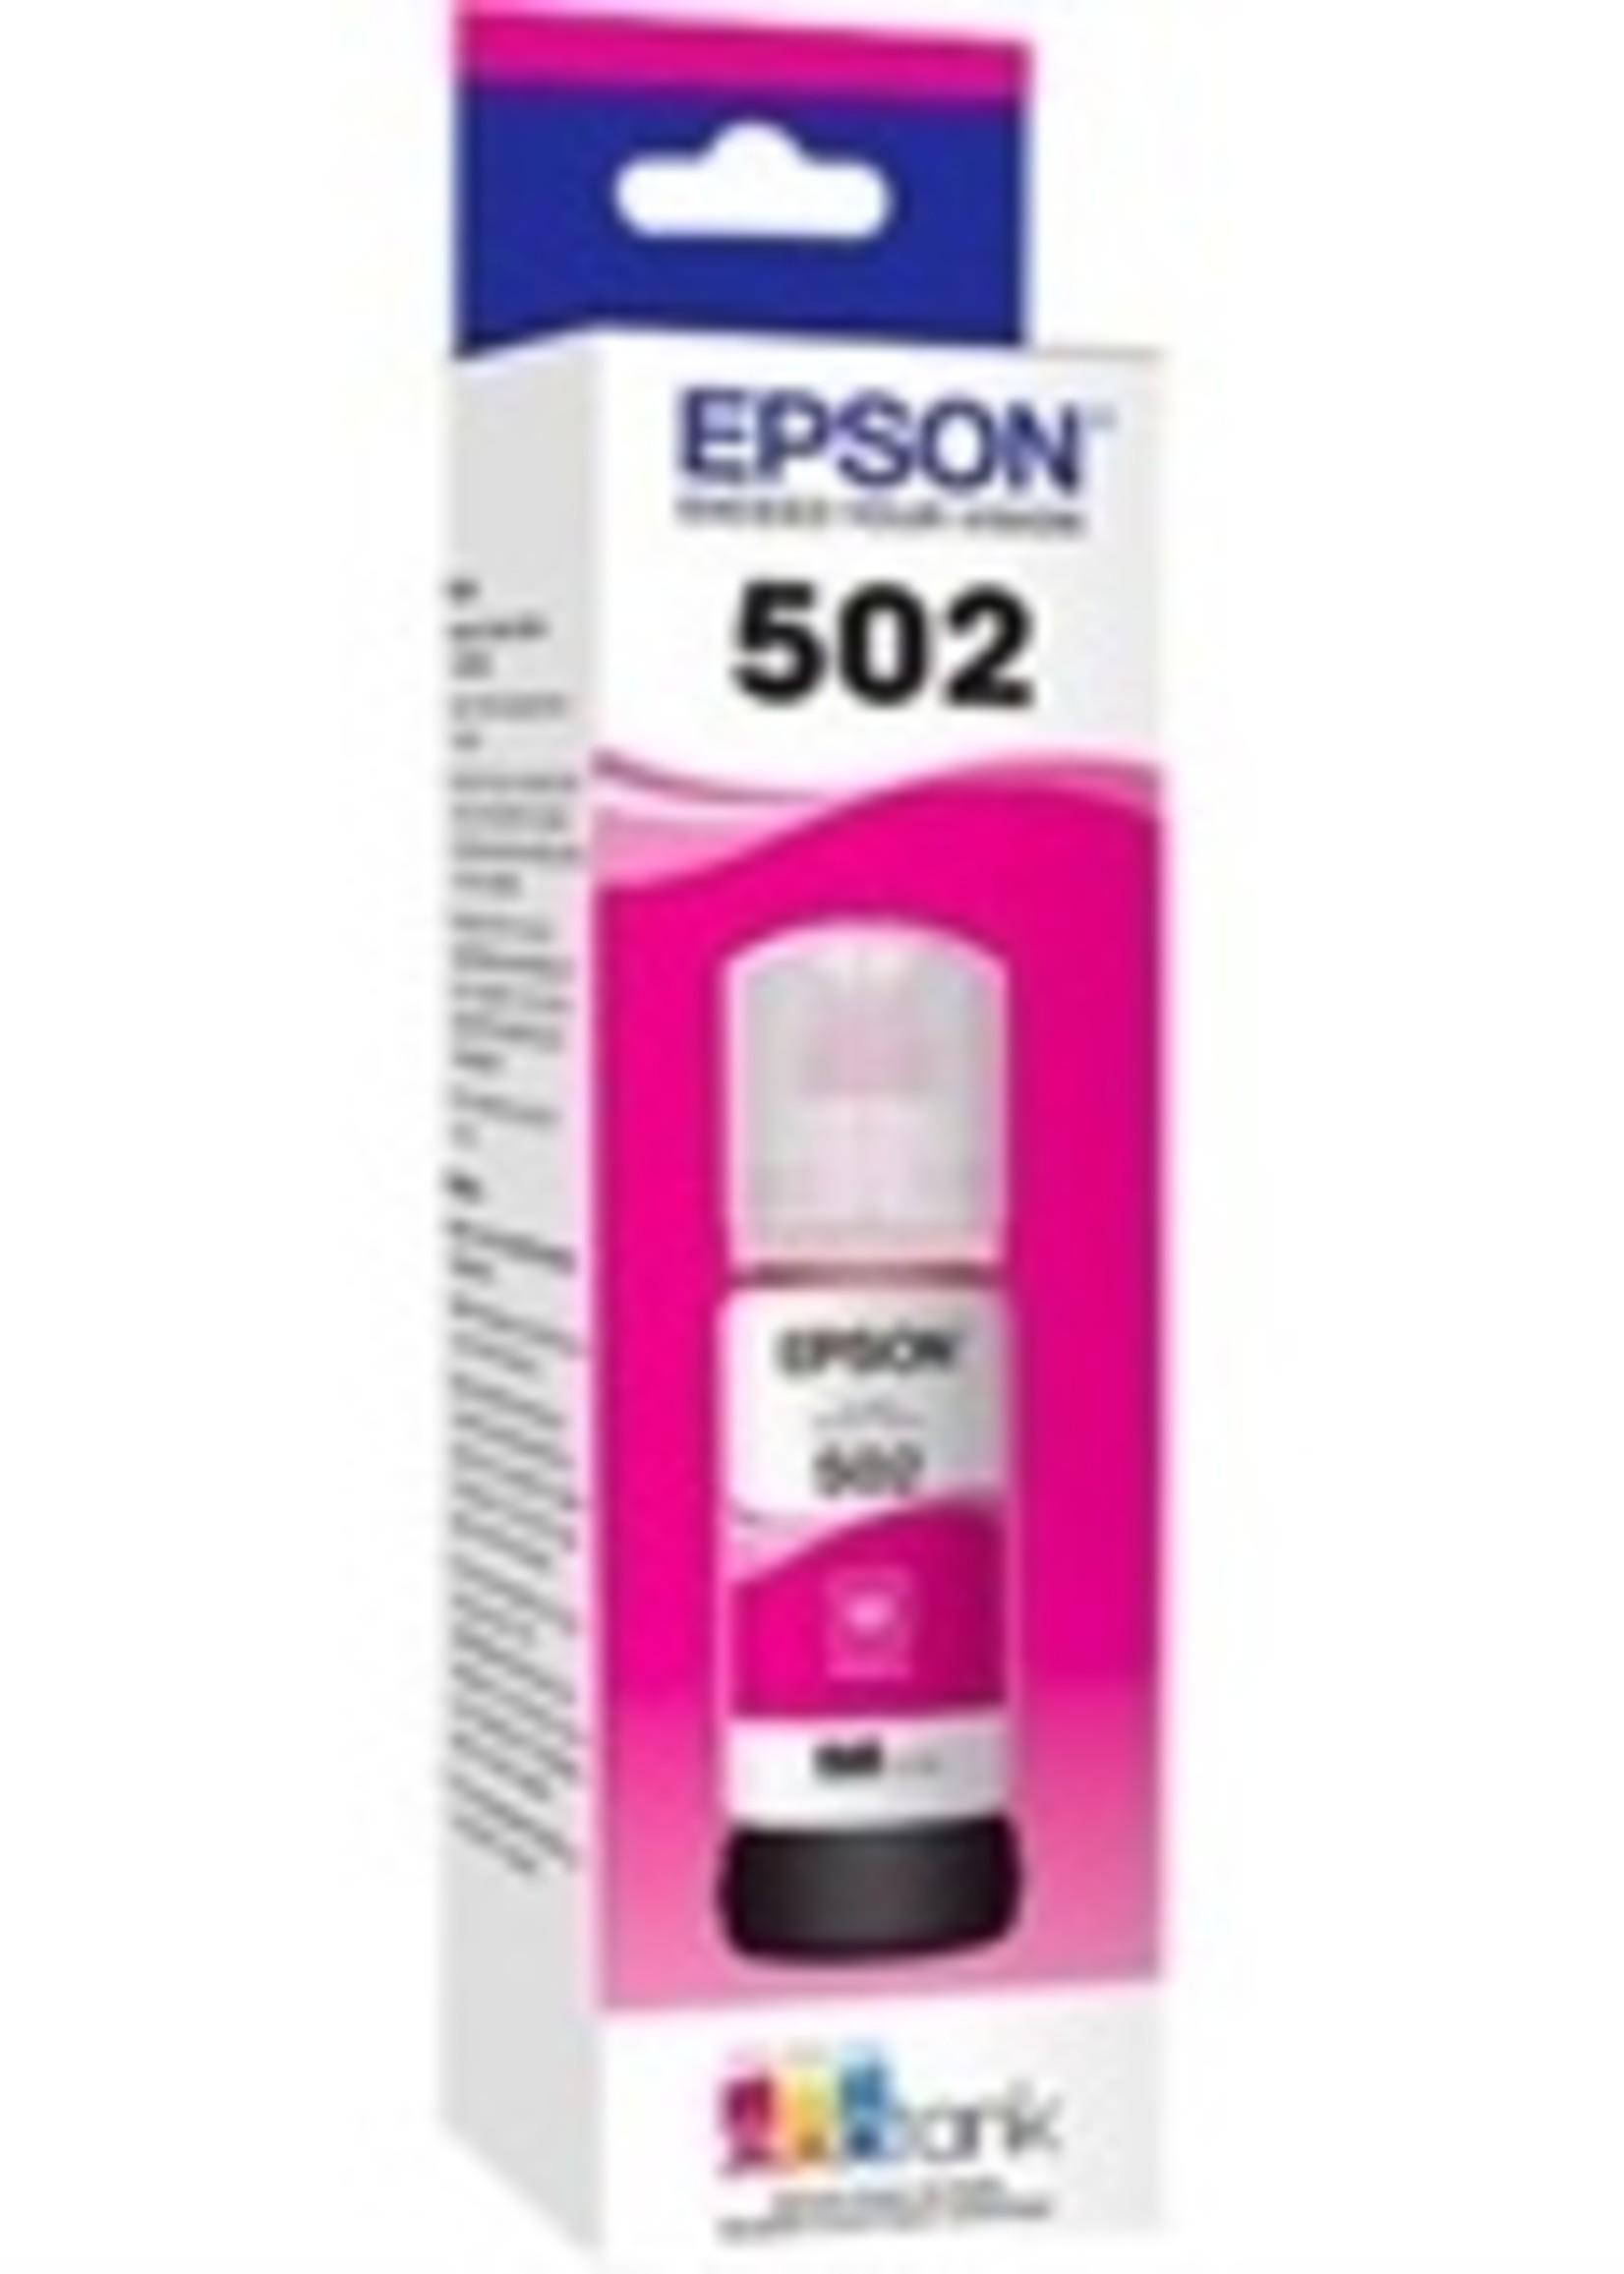 Epson Epson T502 Magenta Ink Bottle